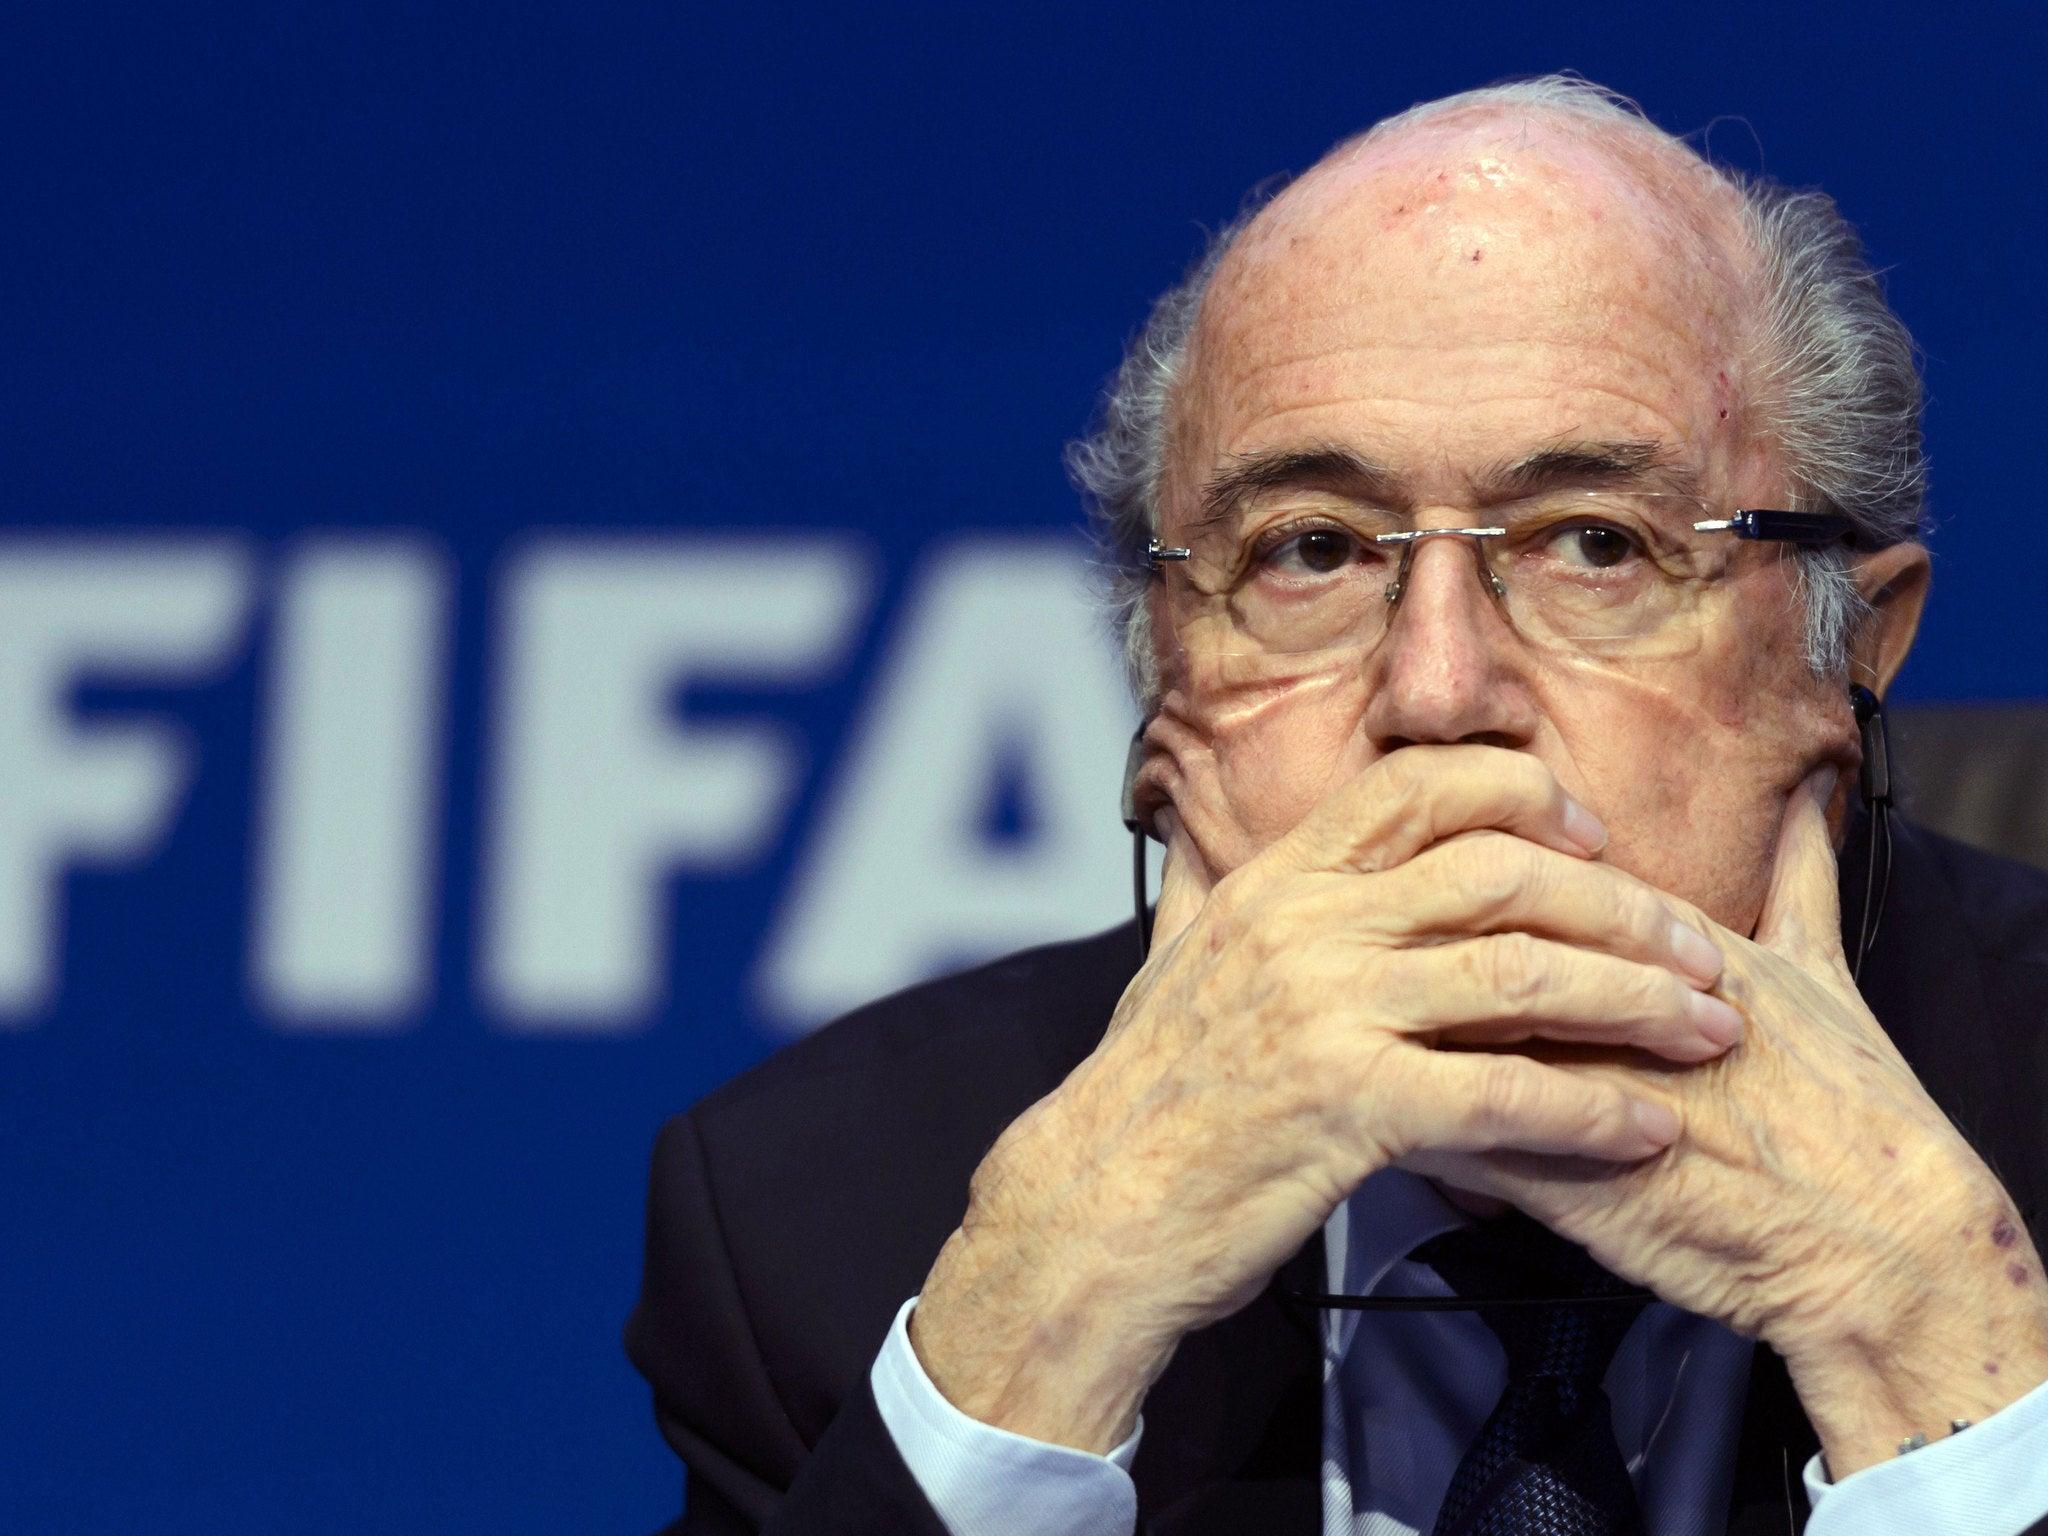 Sepp Blatter To Remain FIFA President Until February Declares Innocence